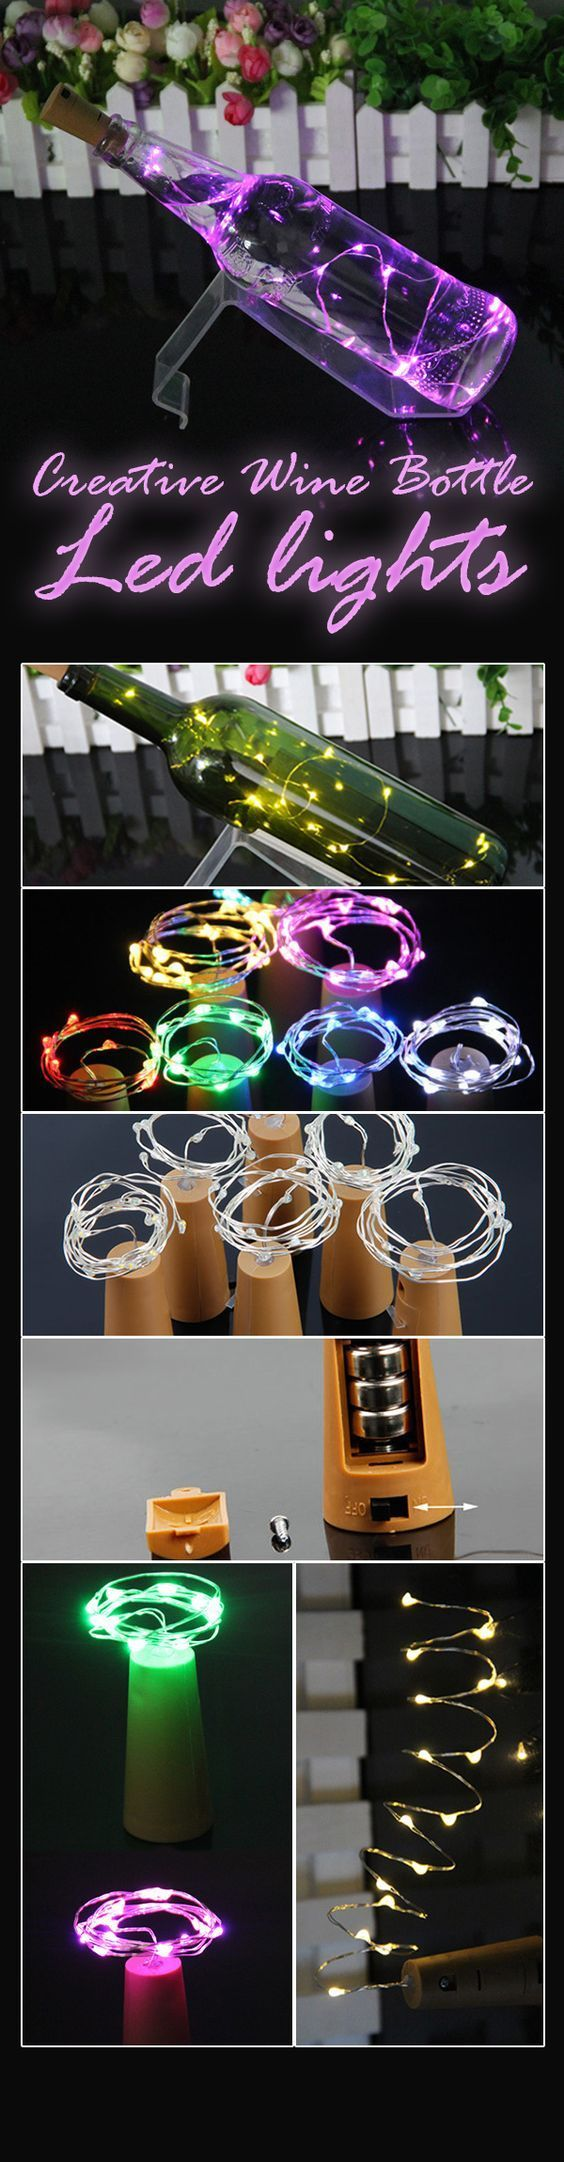 24294f extendable glass dining table - Glass Wine Bottle String Lights Champagne Cork Led Light For Chrismas Festival Party Decor